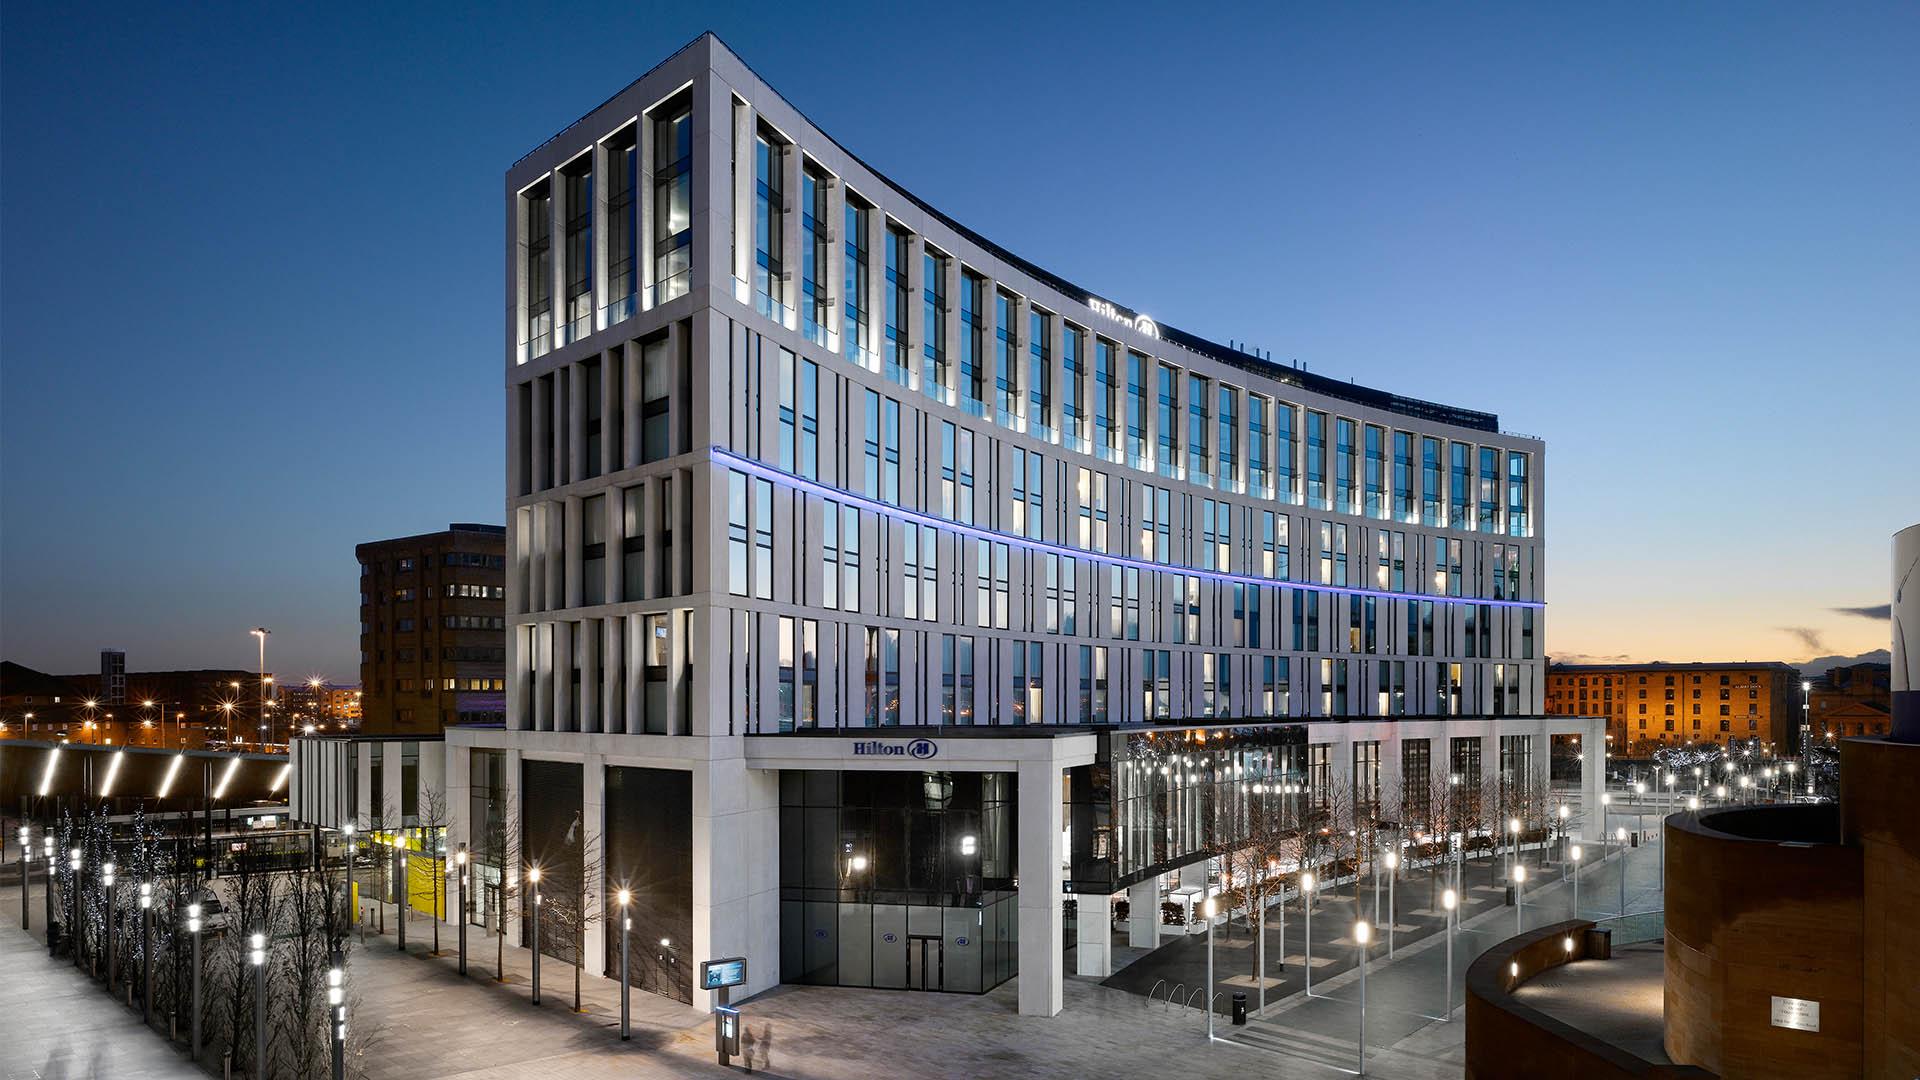 Hilton Hotel Liverpool | Hospitality | AHR | Architects ...